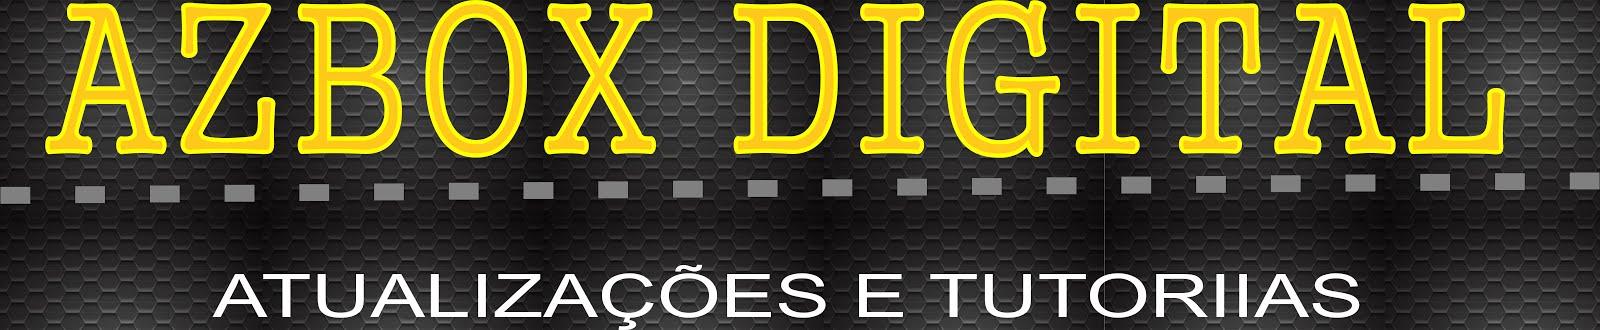 AZBOX DIGITAL 2015